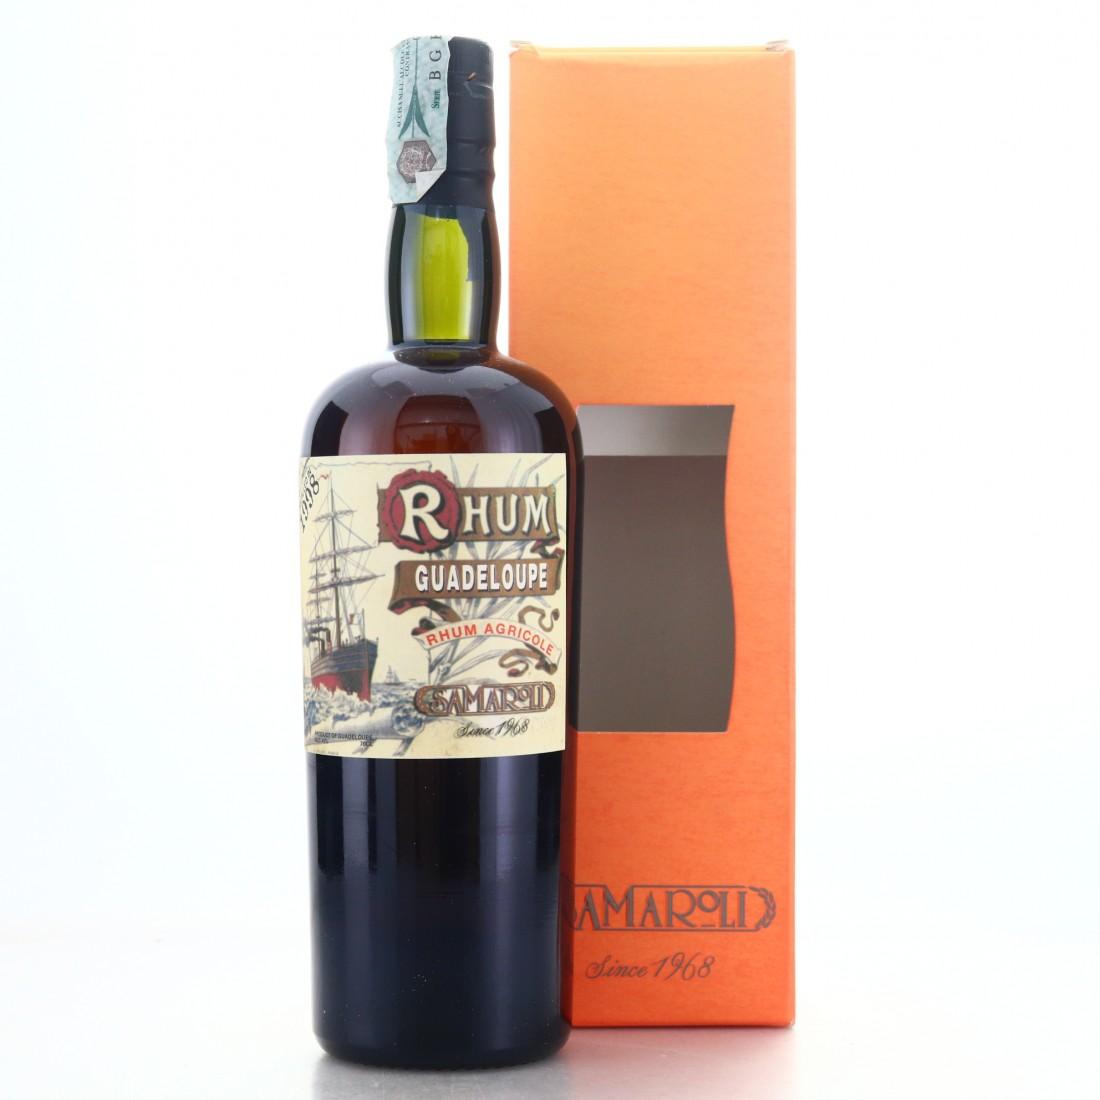 Guadeloupe Rum 1998 Samaroli Single Cask #9